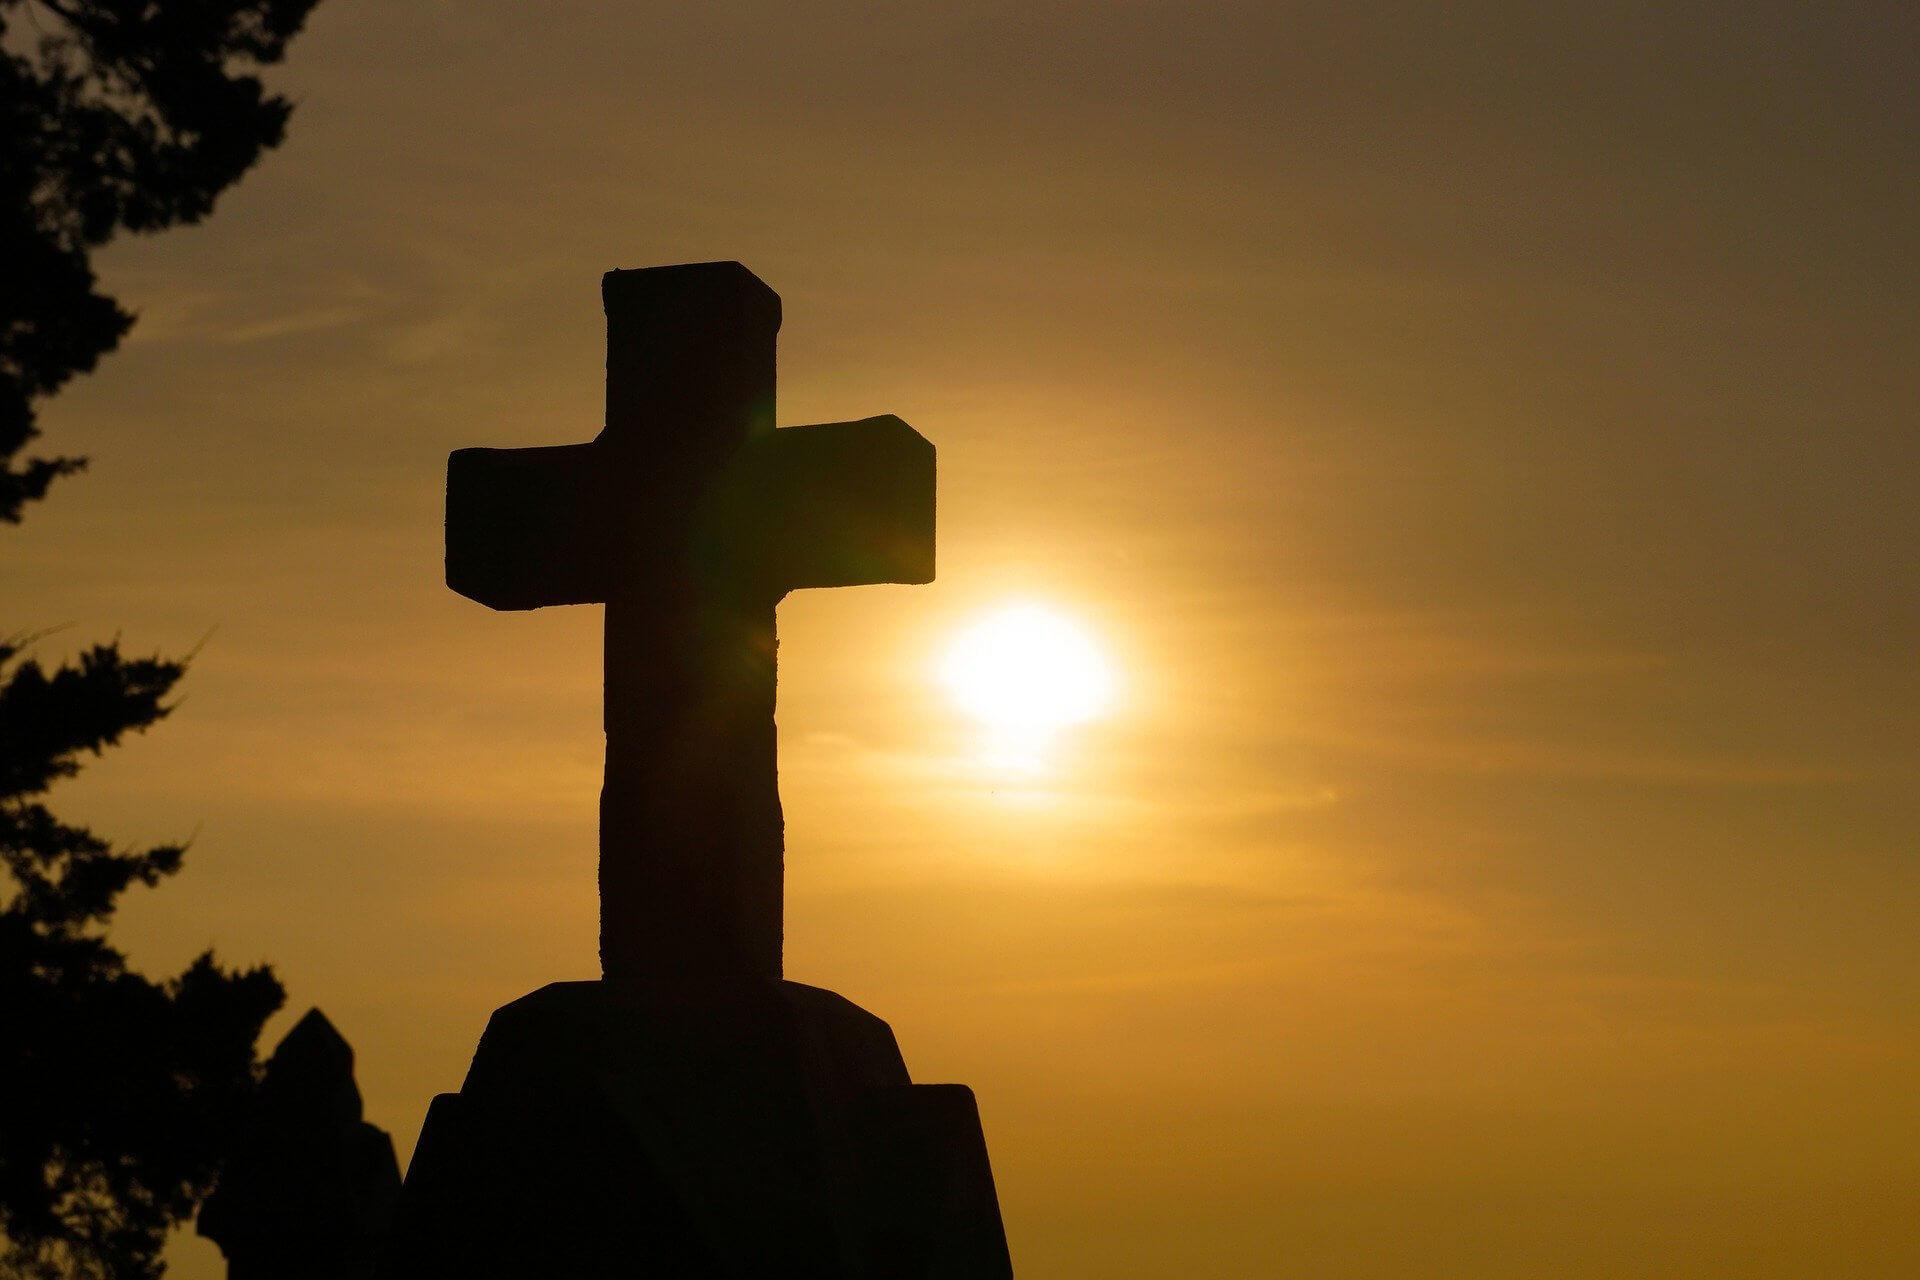 Kościół polskokatolicki a rzymskokatolicki– różnice